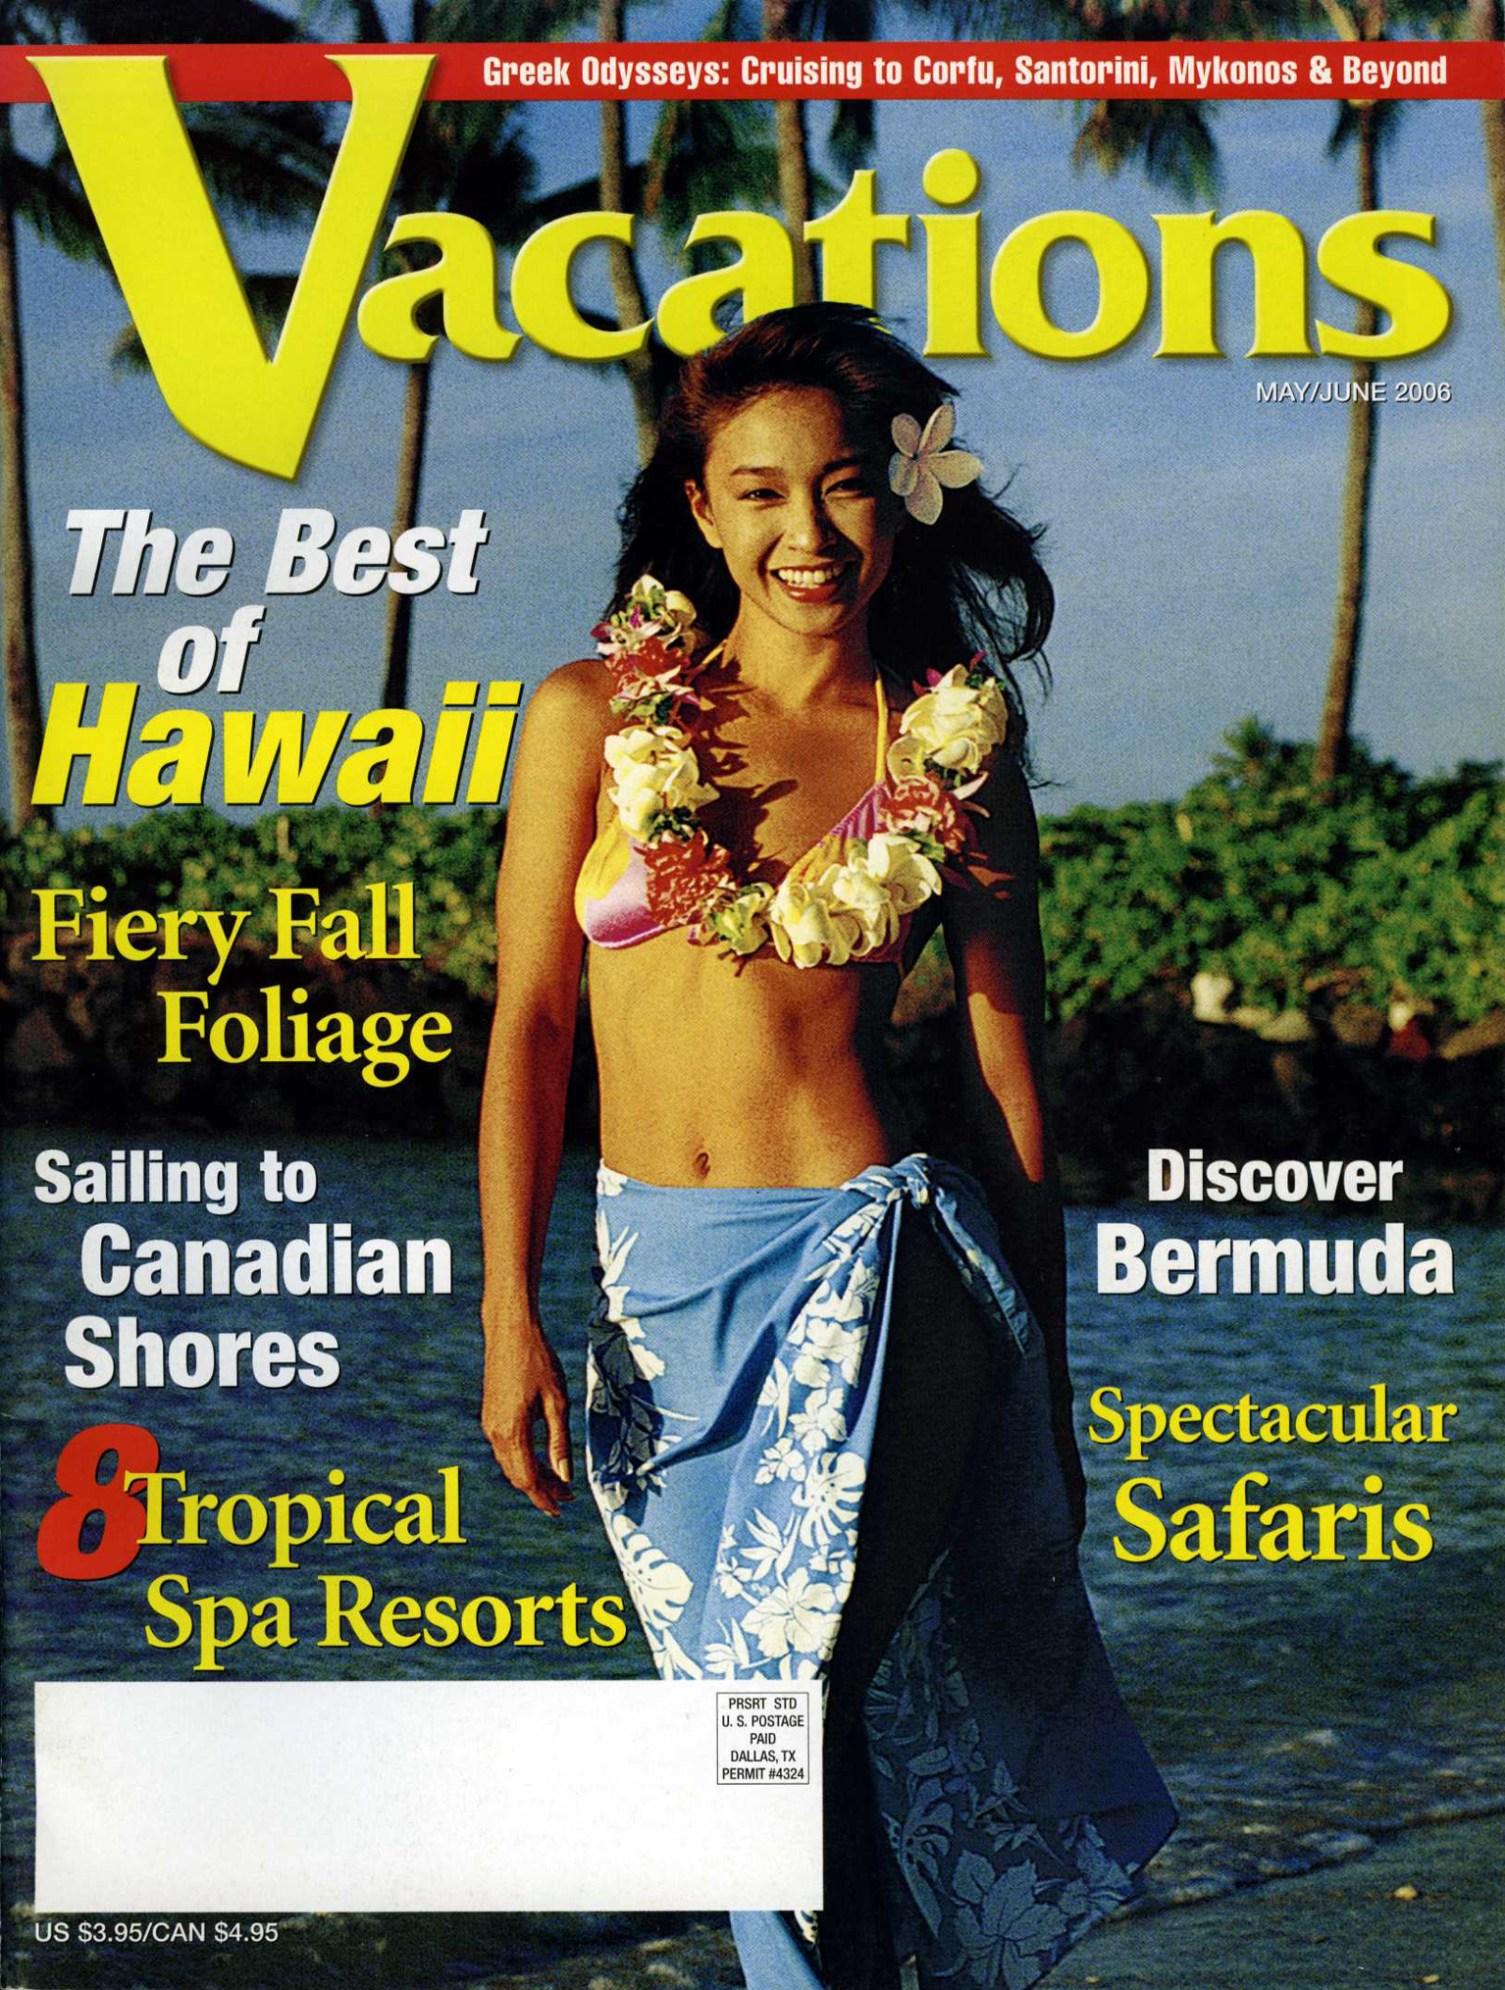 05-06_COVER_CrusingCanada, FallFoliage, Hawaii, Safaris